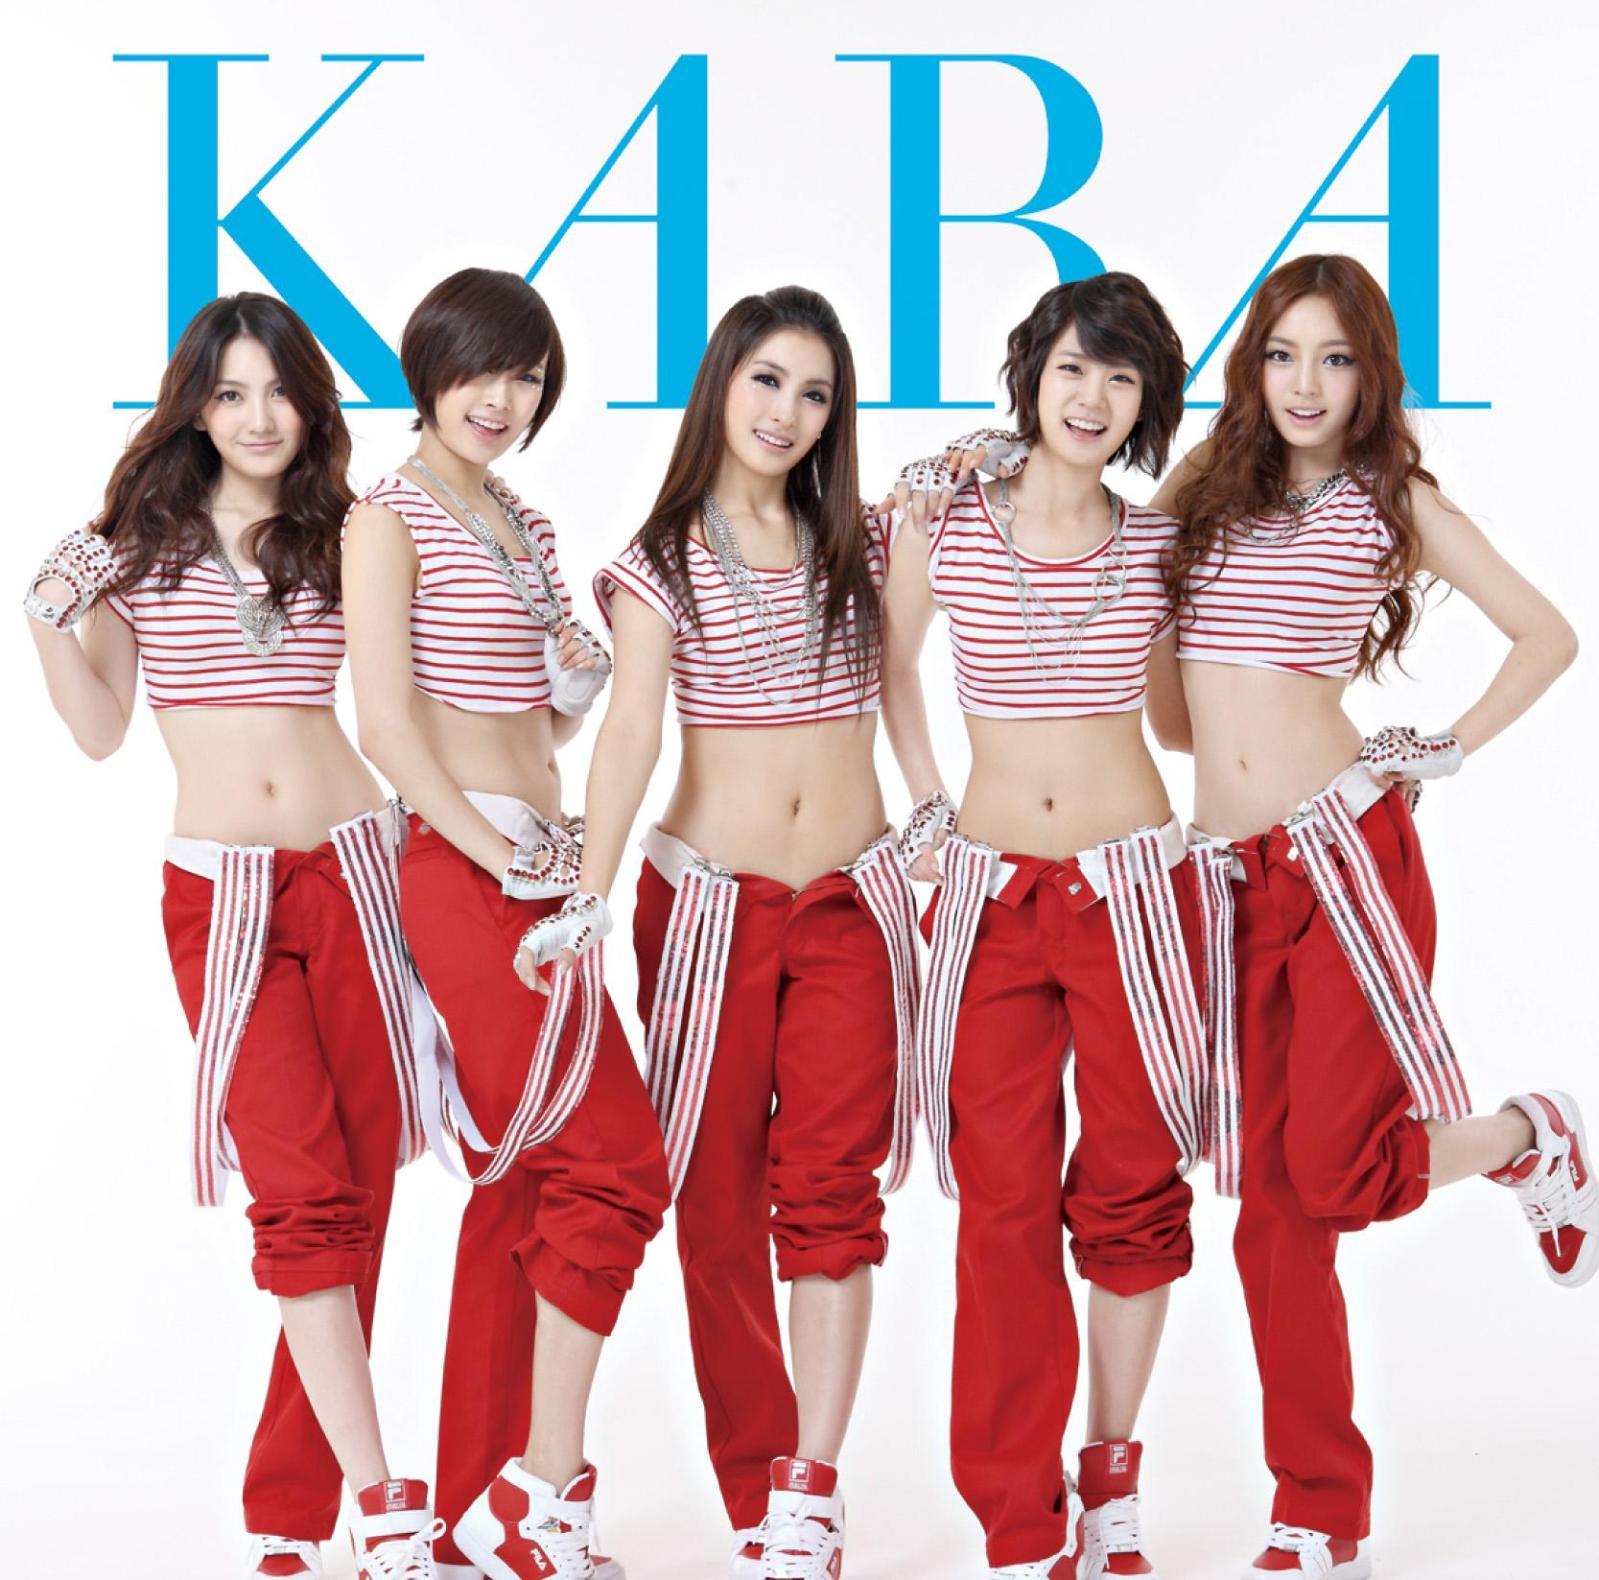 http://3.bp.blogspot.com/-0weOR2sq4OM/TpfgcqNx_LI/AAAAAAAAAEM/vggvoVpOF54/s1600/KARA+%25281%2529.jpg